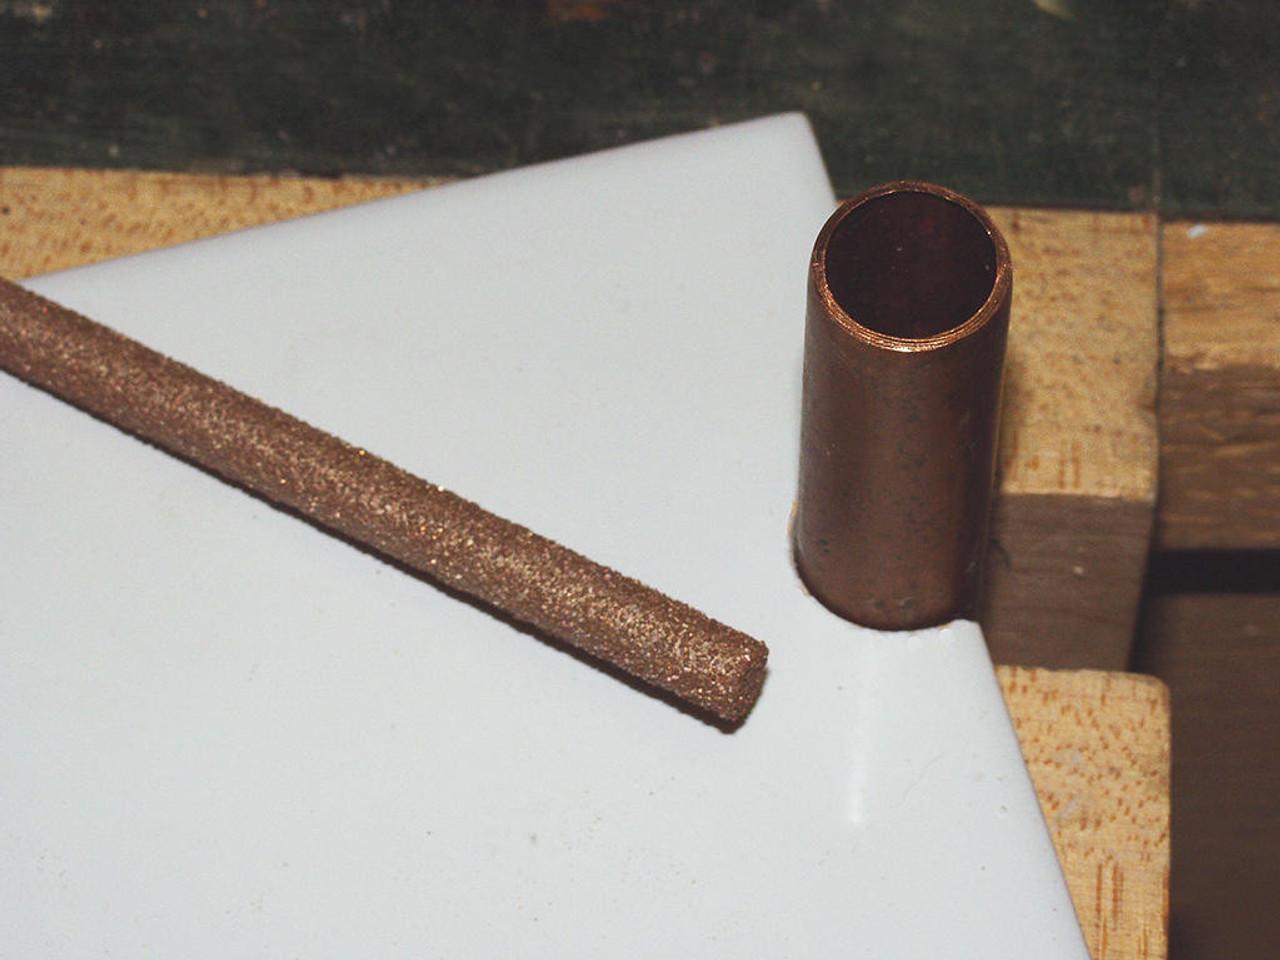 Dura-Grit Carbide 1/4 Round File 120 Grit